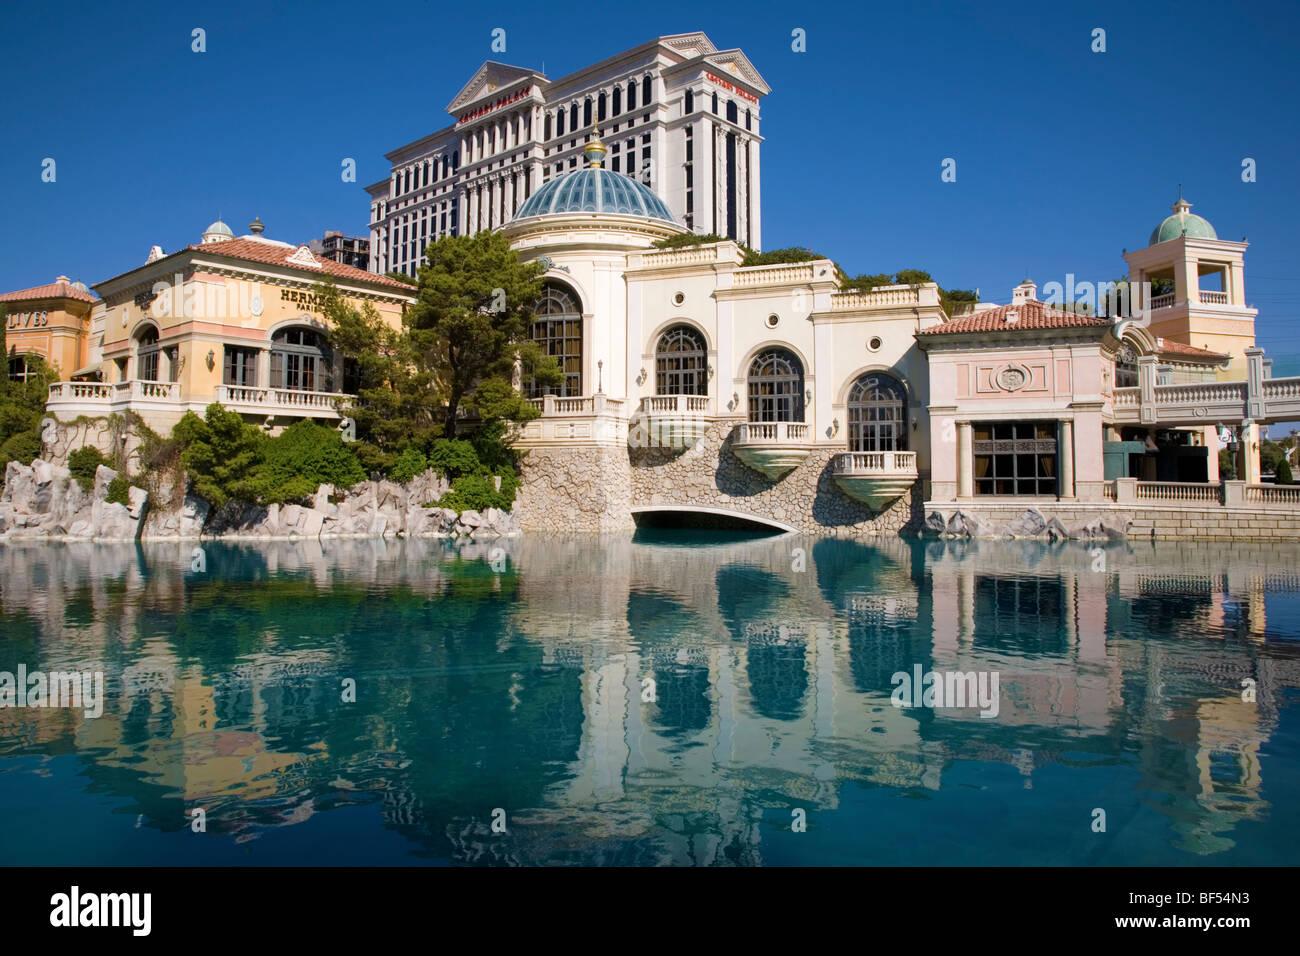 Lakeside Italian Riviera Shops And Restaurants At Bellagio Hotel